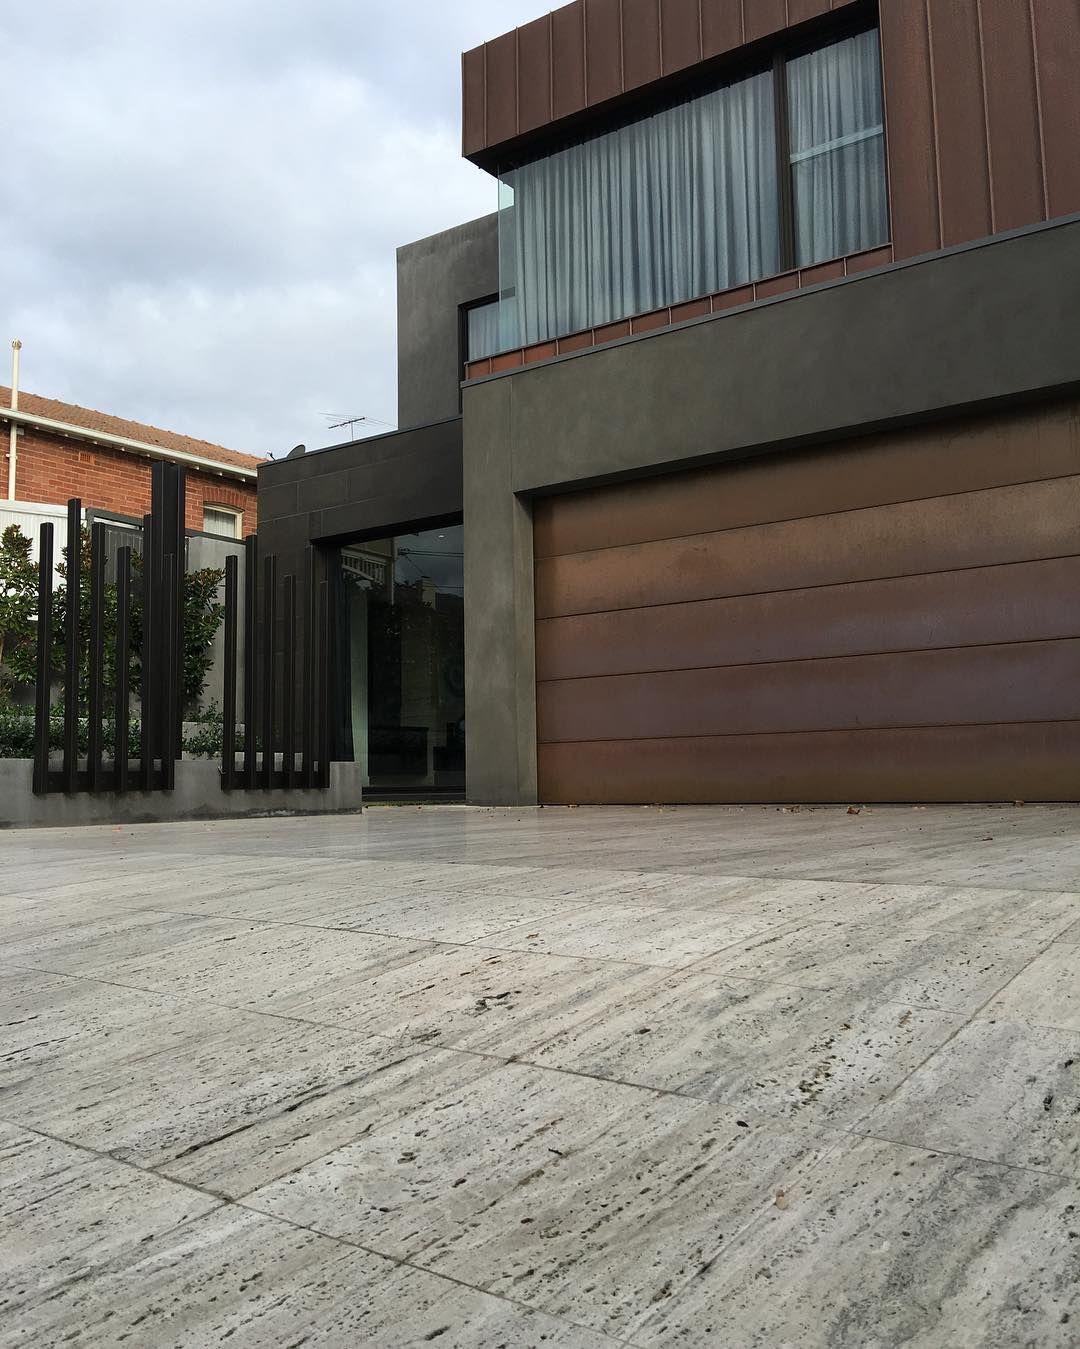 Daniel cassettai design creates a stylish and spacious interior in the residential suburb of floreat architecture house design pinterest interior